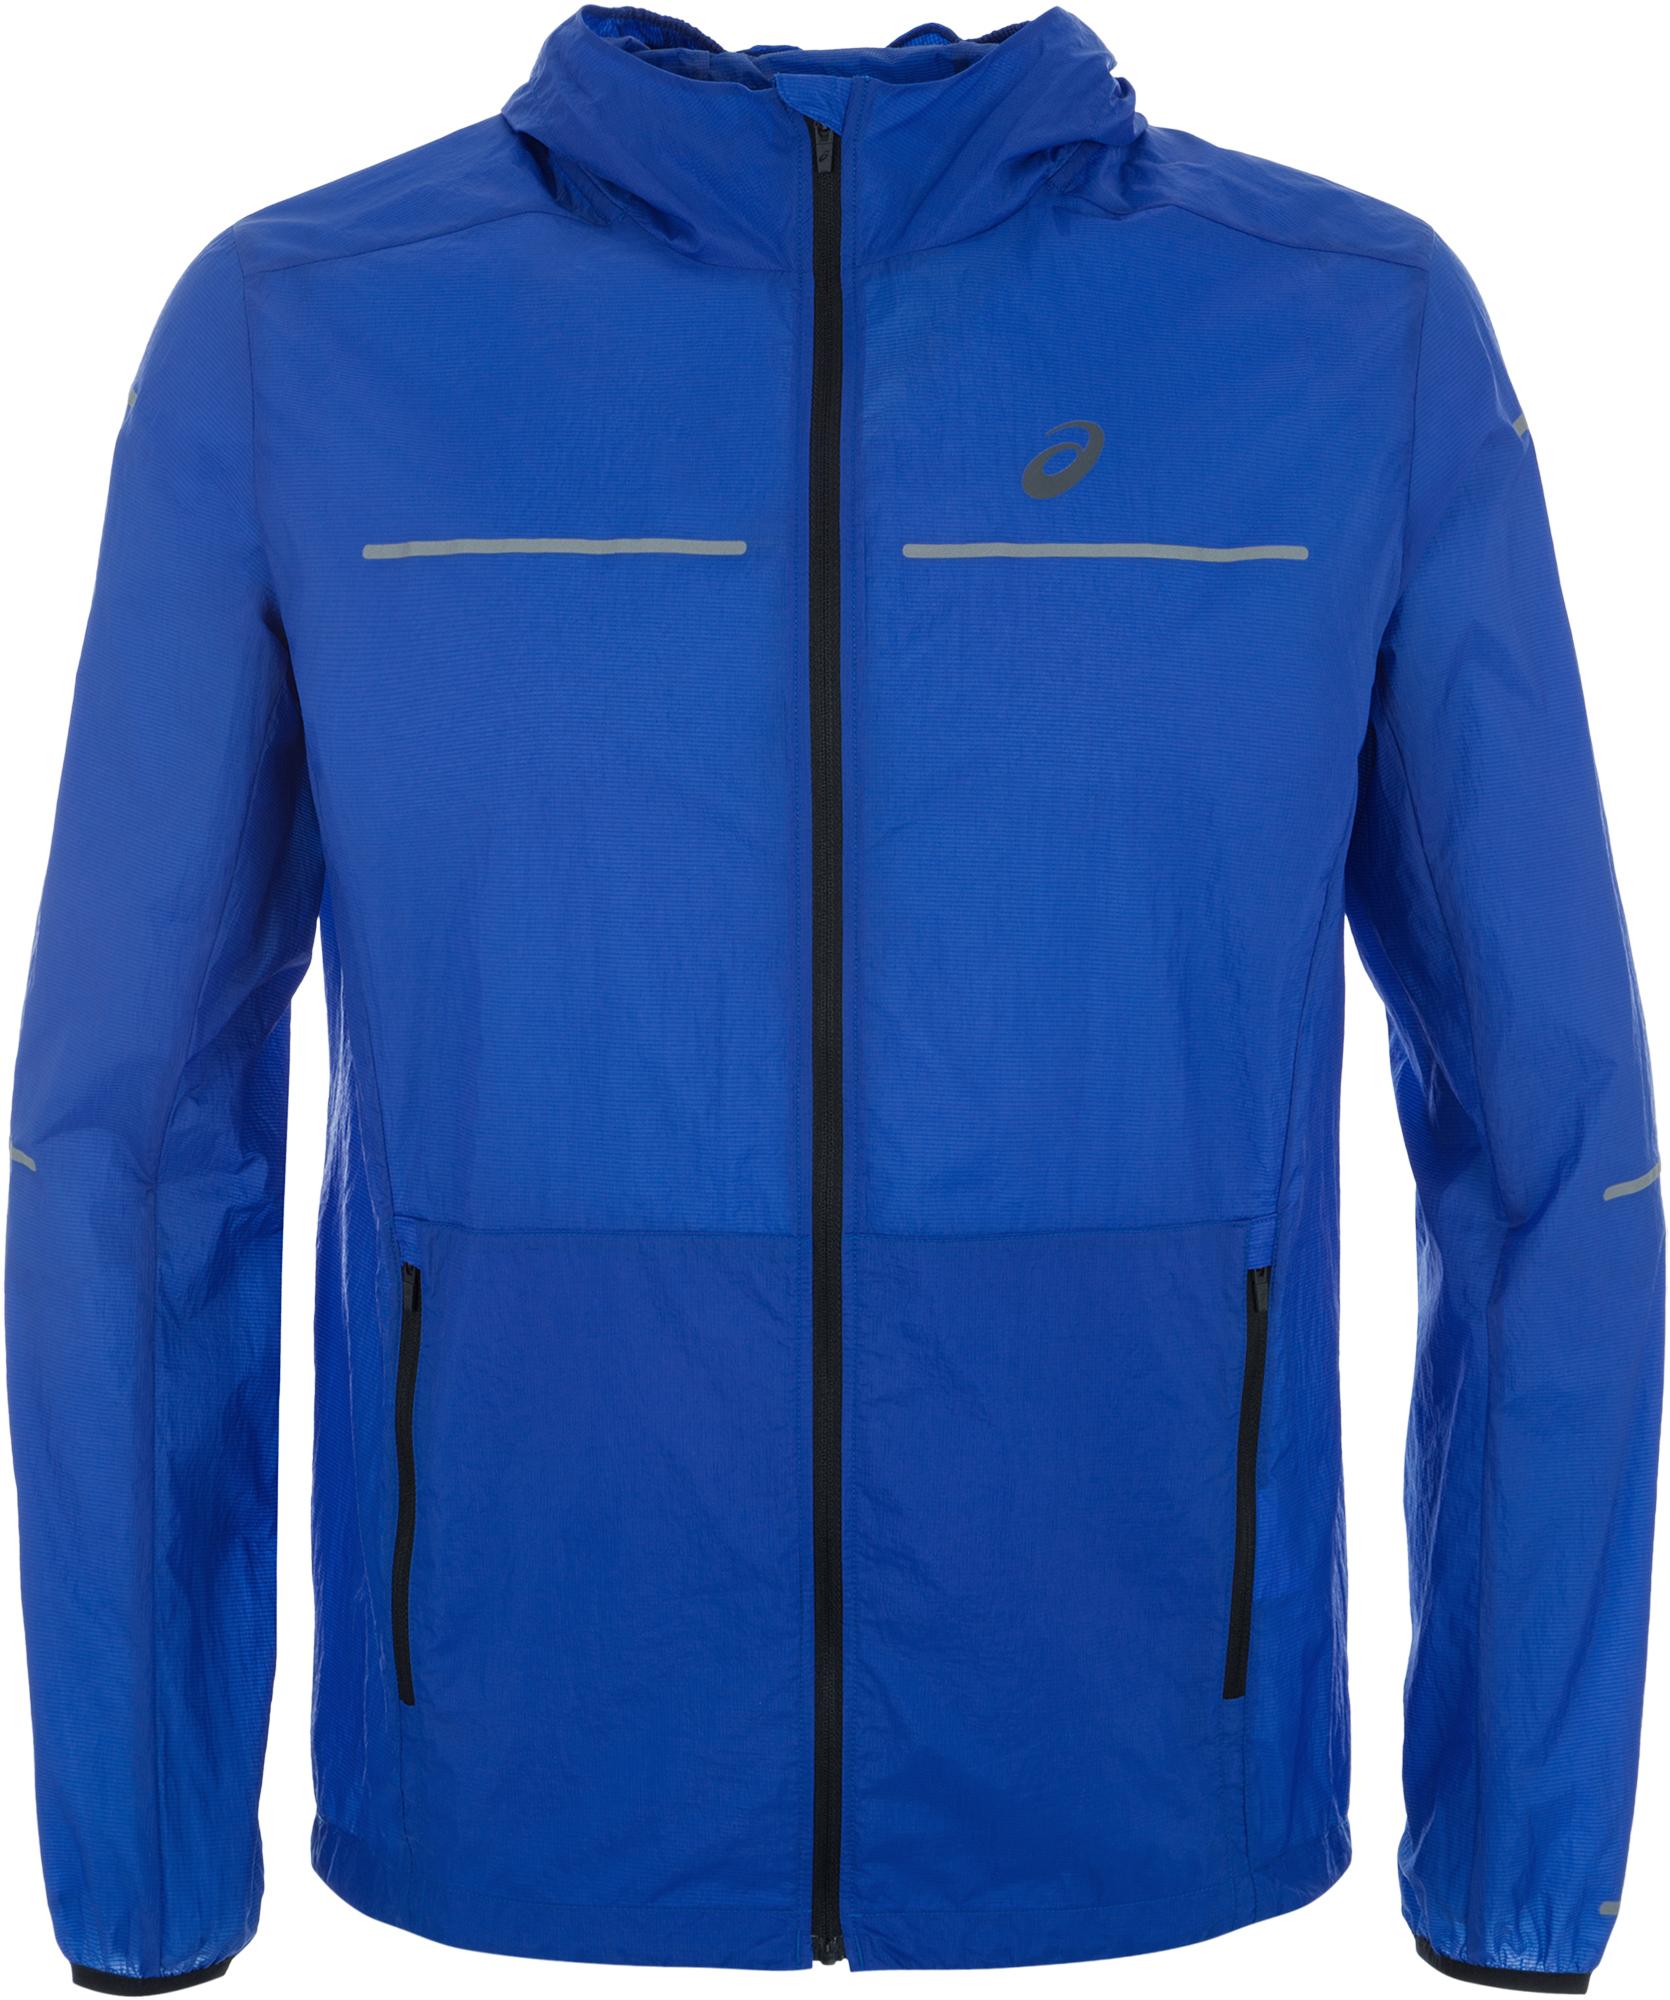 цена на ASICS Куртка мужская ASICS Lite-Show, размер 46-48